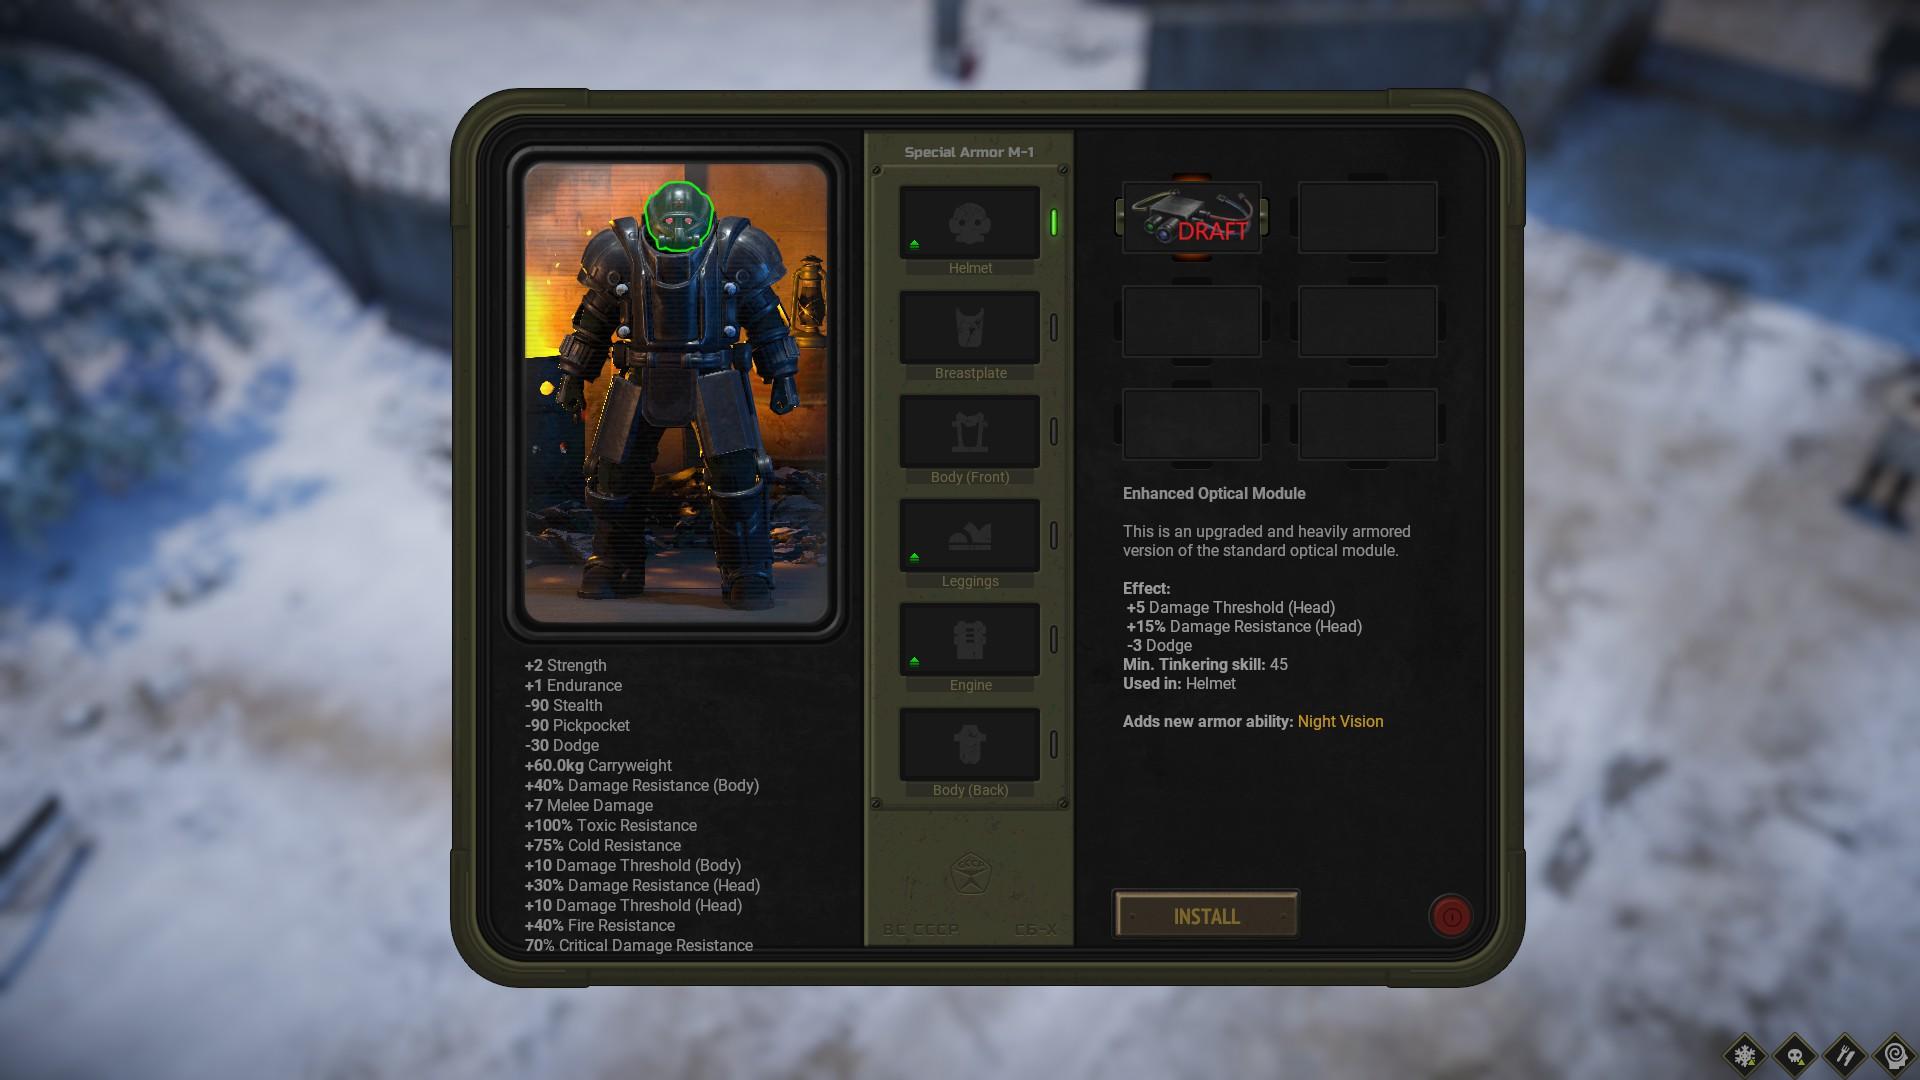 ATOM RPG Trudograd - Gameplay Tips & Walkthrough - Special Armor - 4ED352C